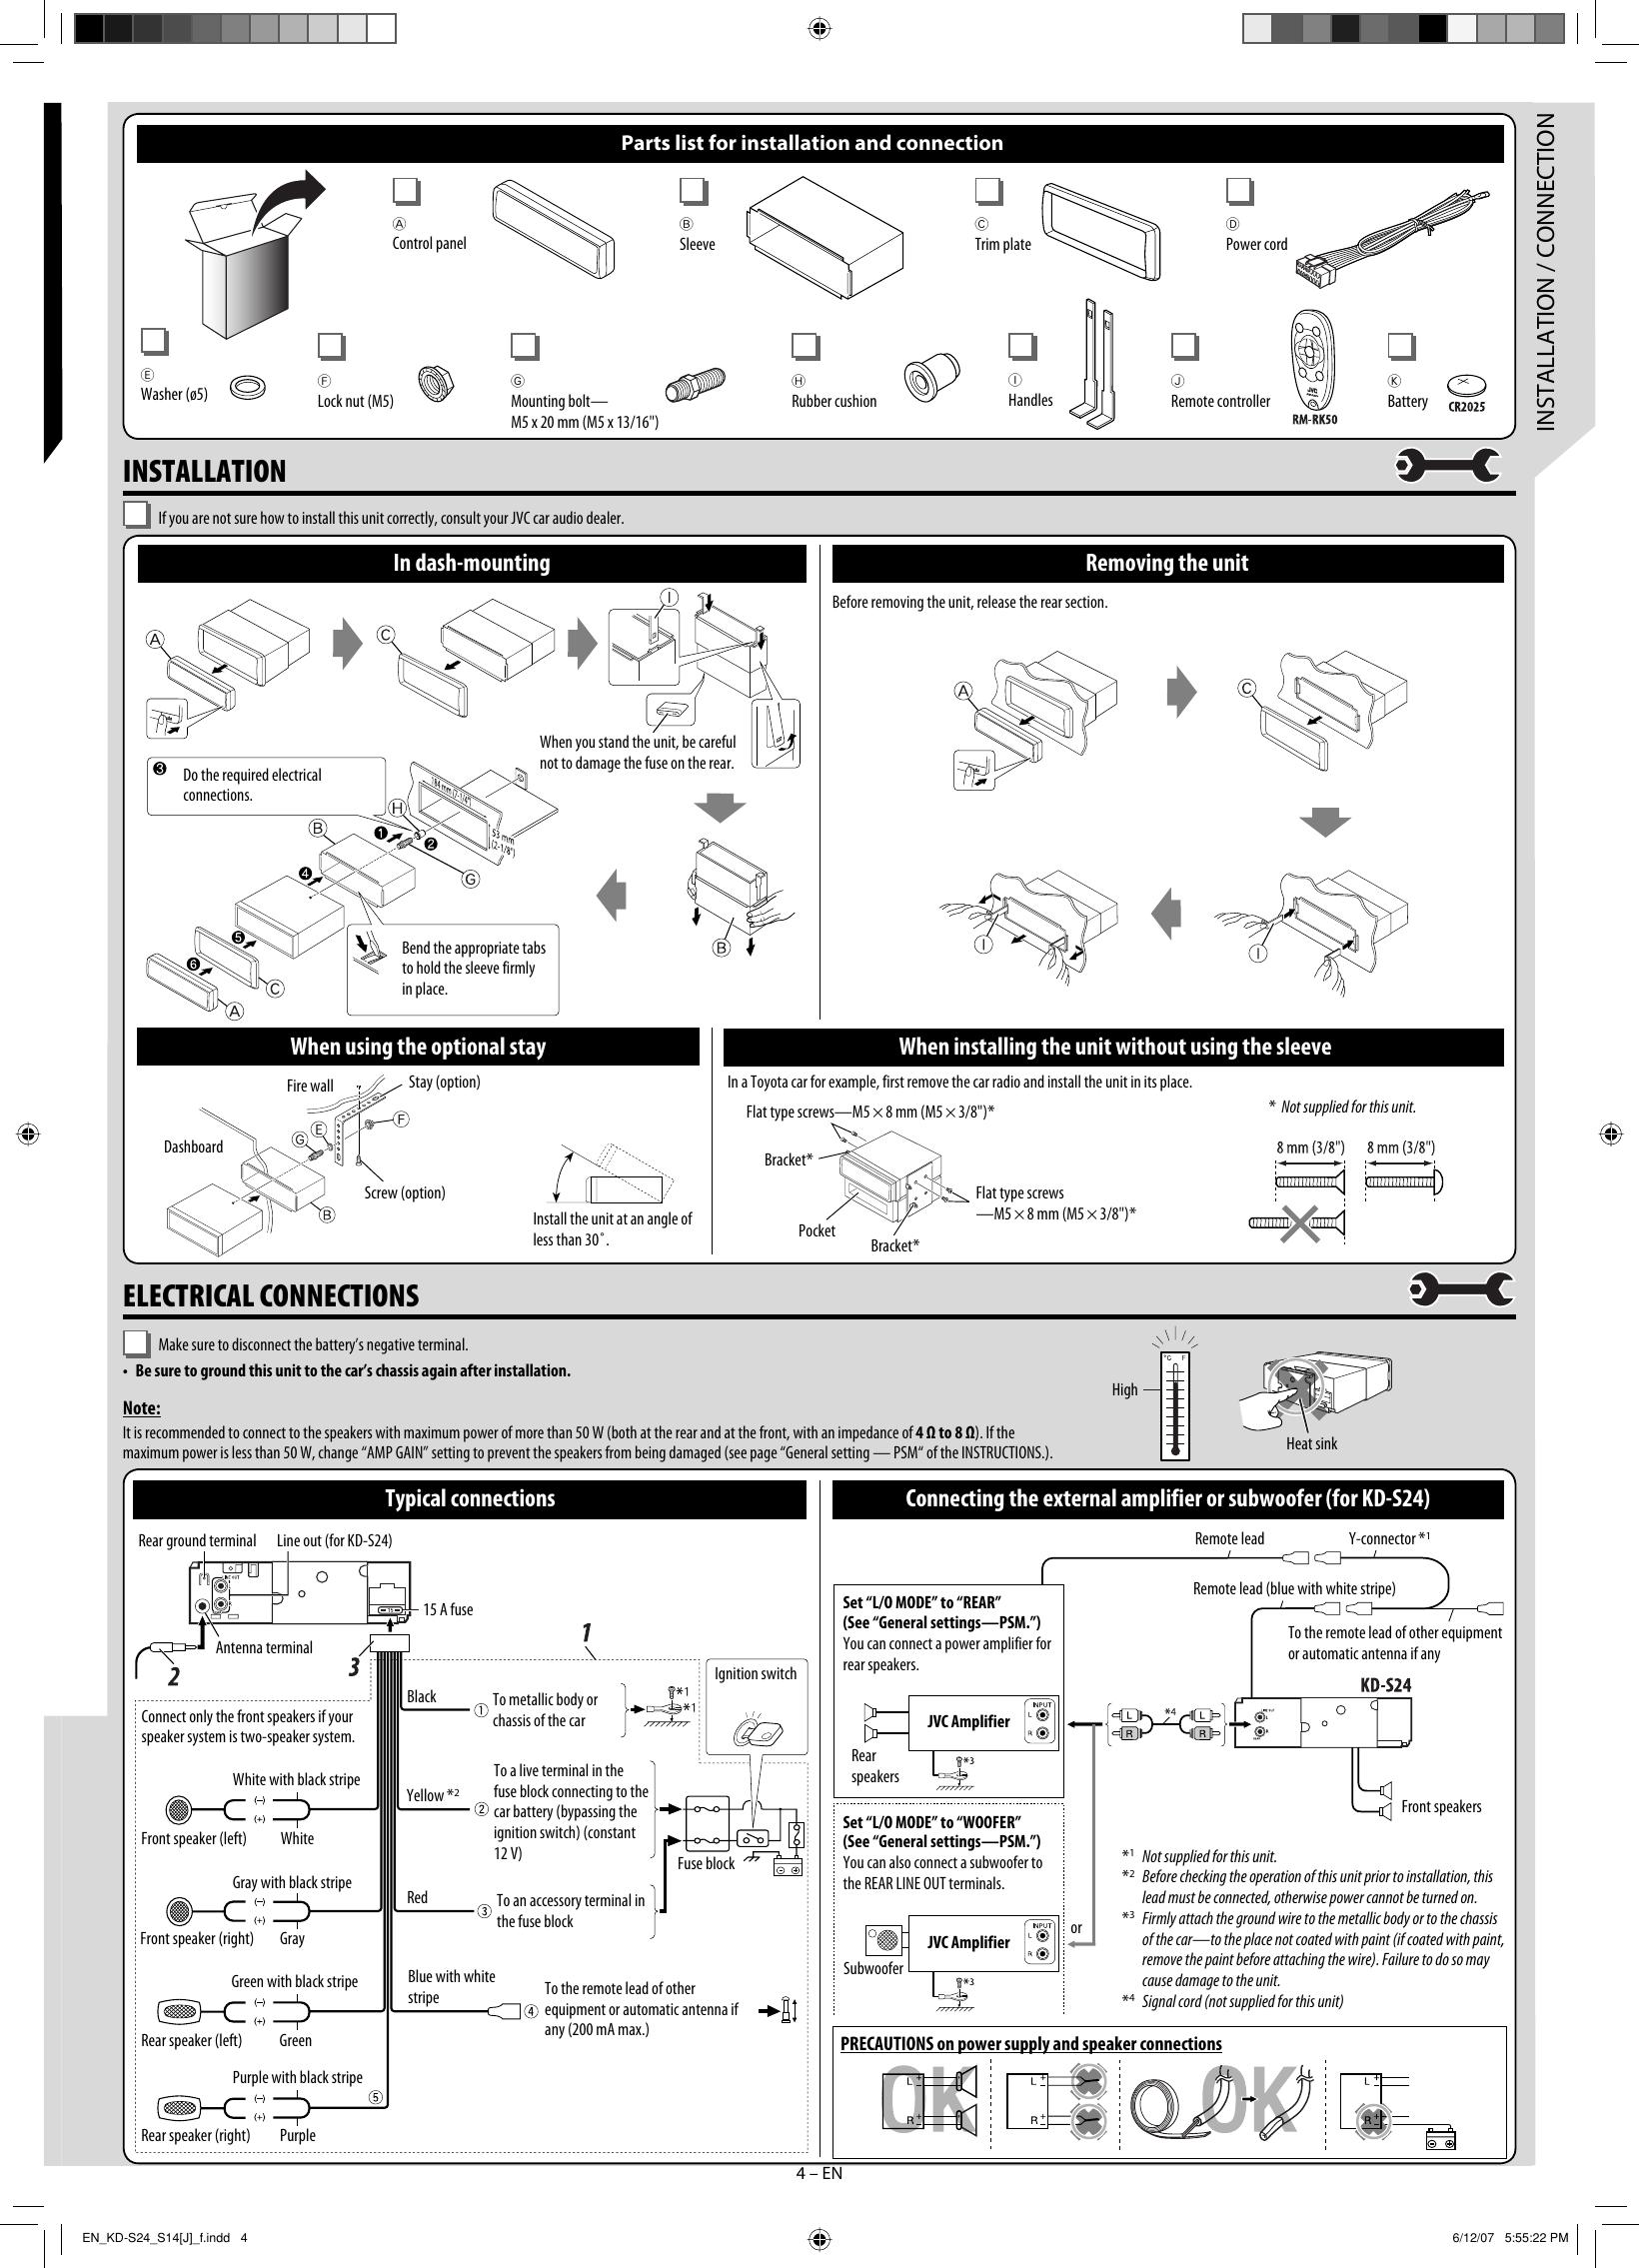 jvc kd s14 users manual en kd s24 s14 j f rh usermanual wiki JVC User Manual KD- G430 JVC Car Stereo User Manual